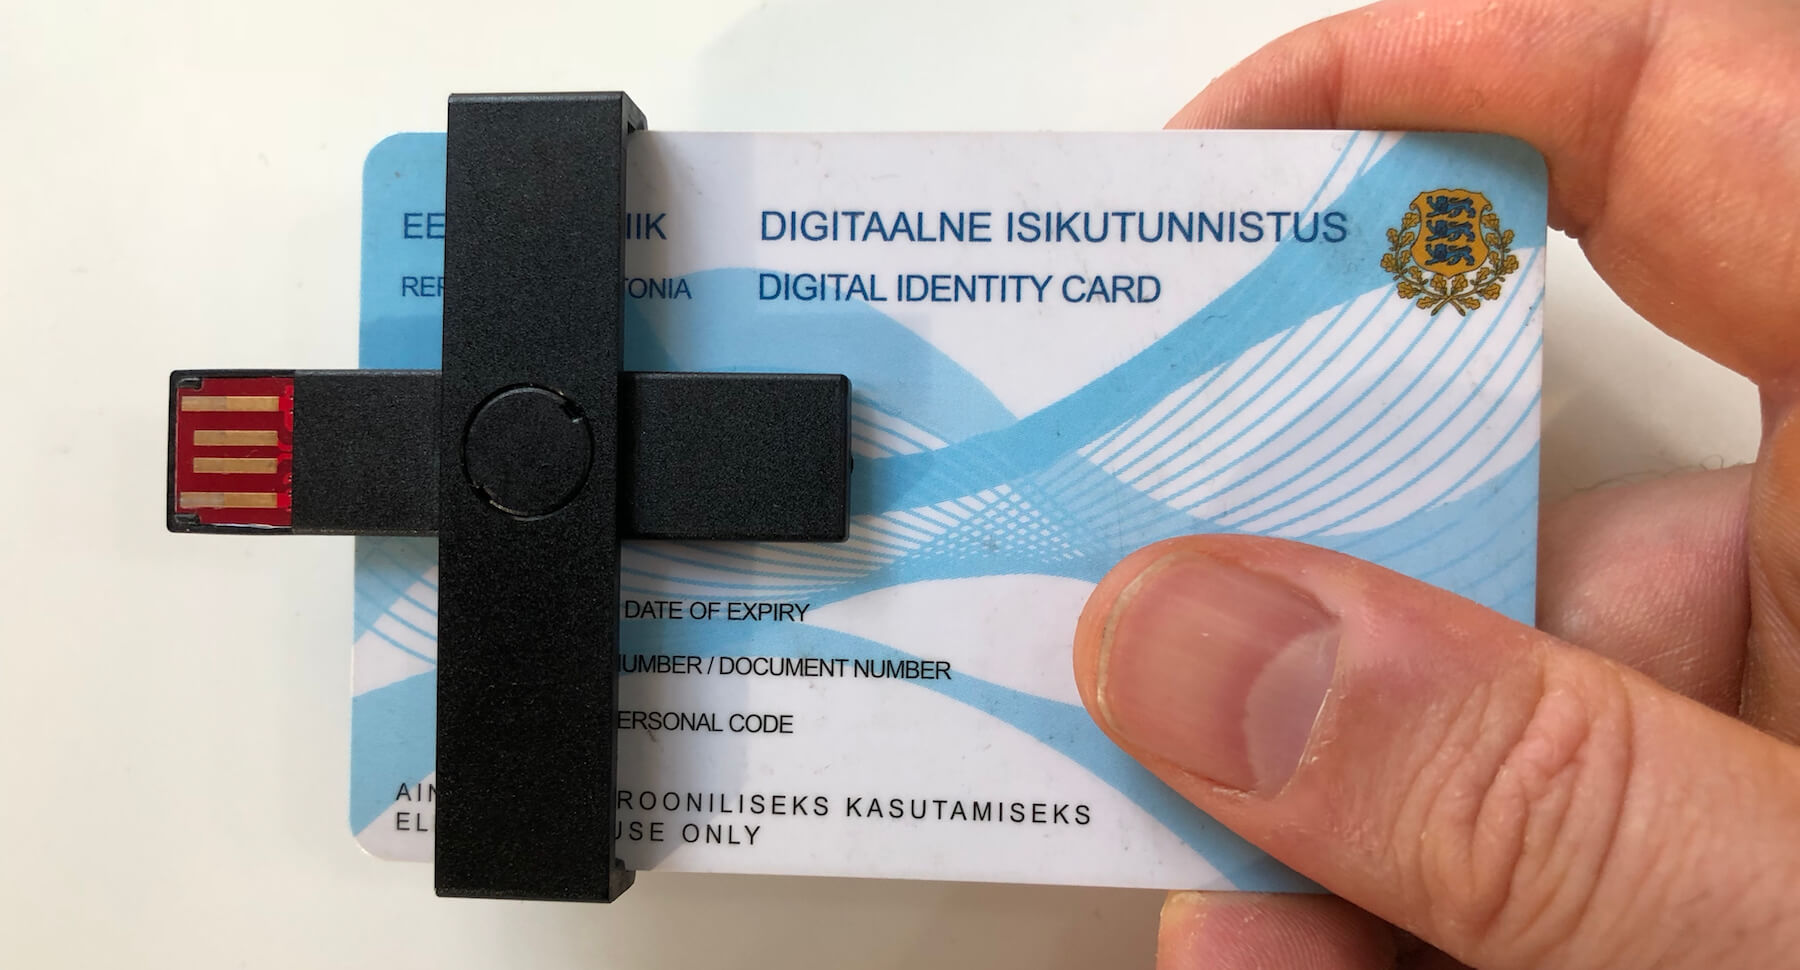 Tu Empresa En Estonia - Empezar a funcionar con la tarjeta de e-Resident